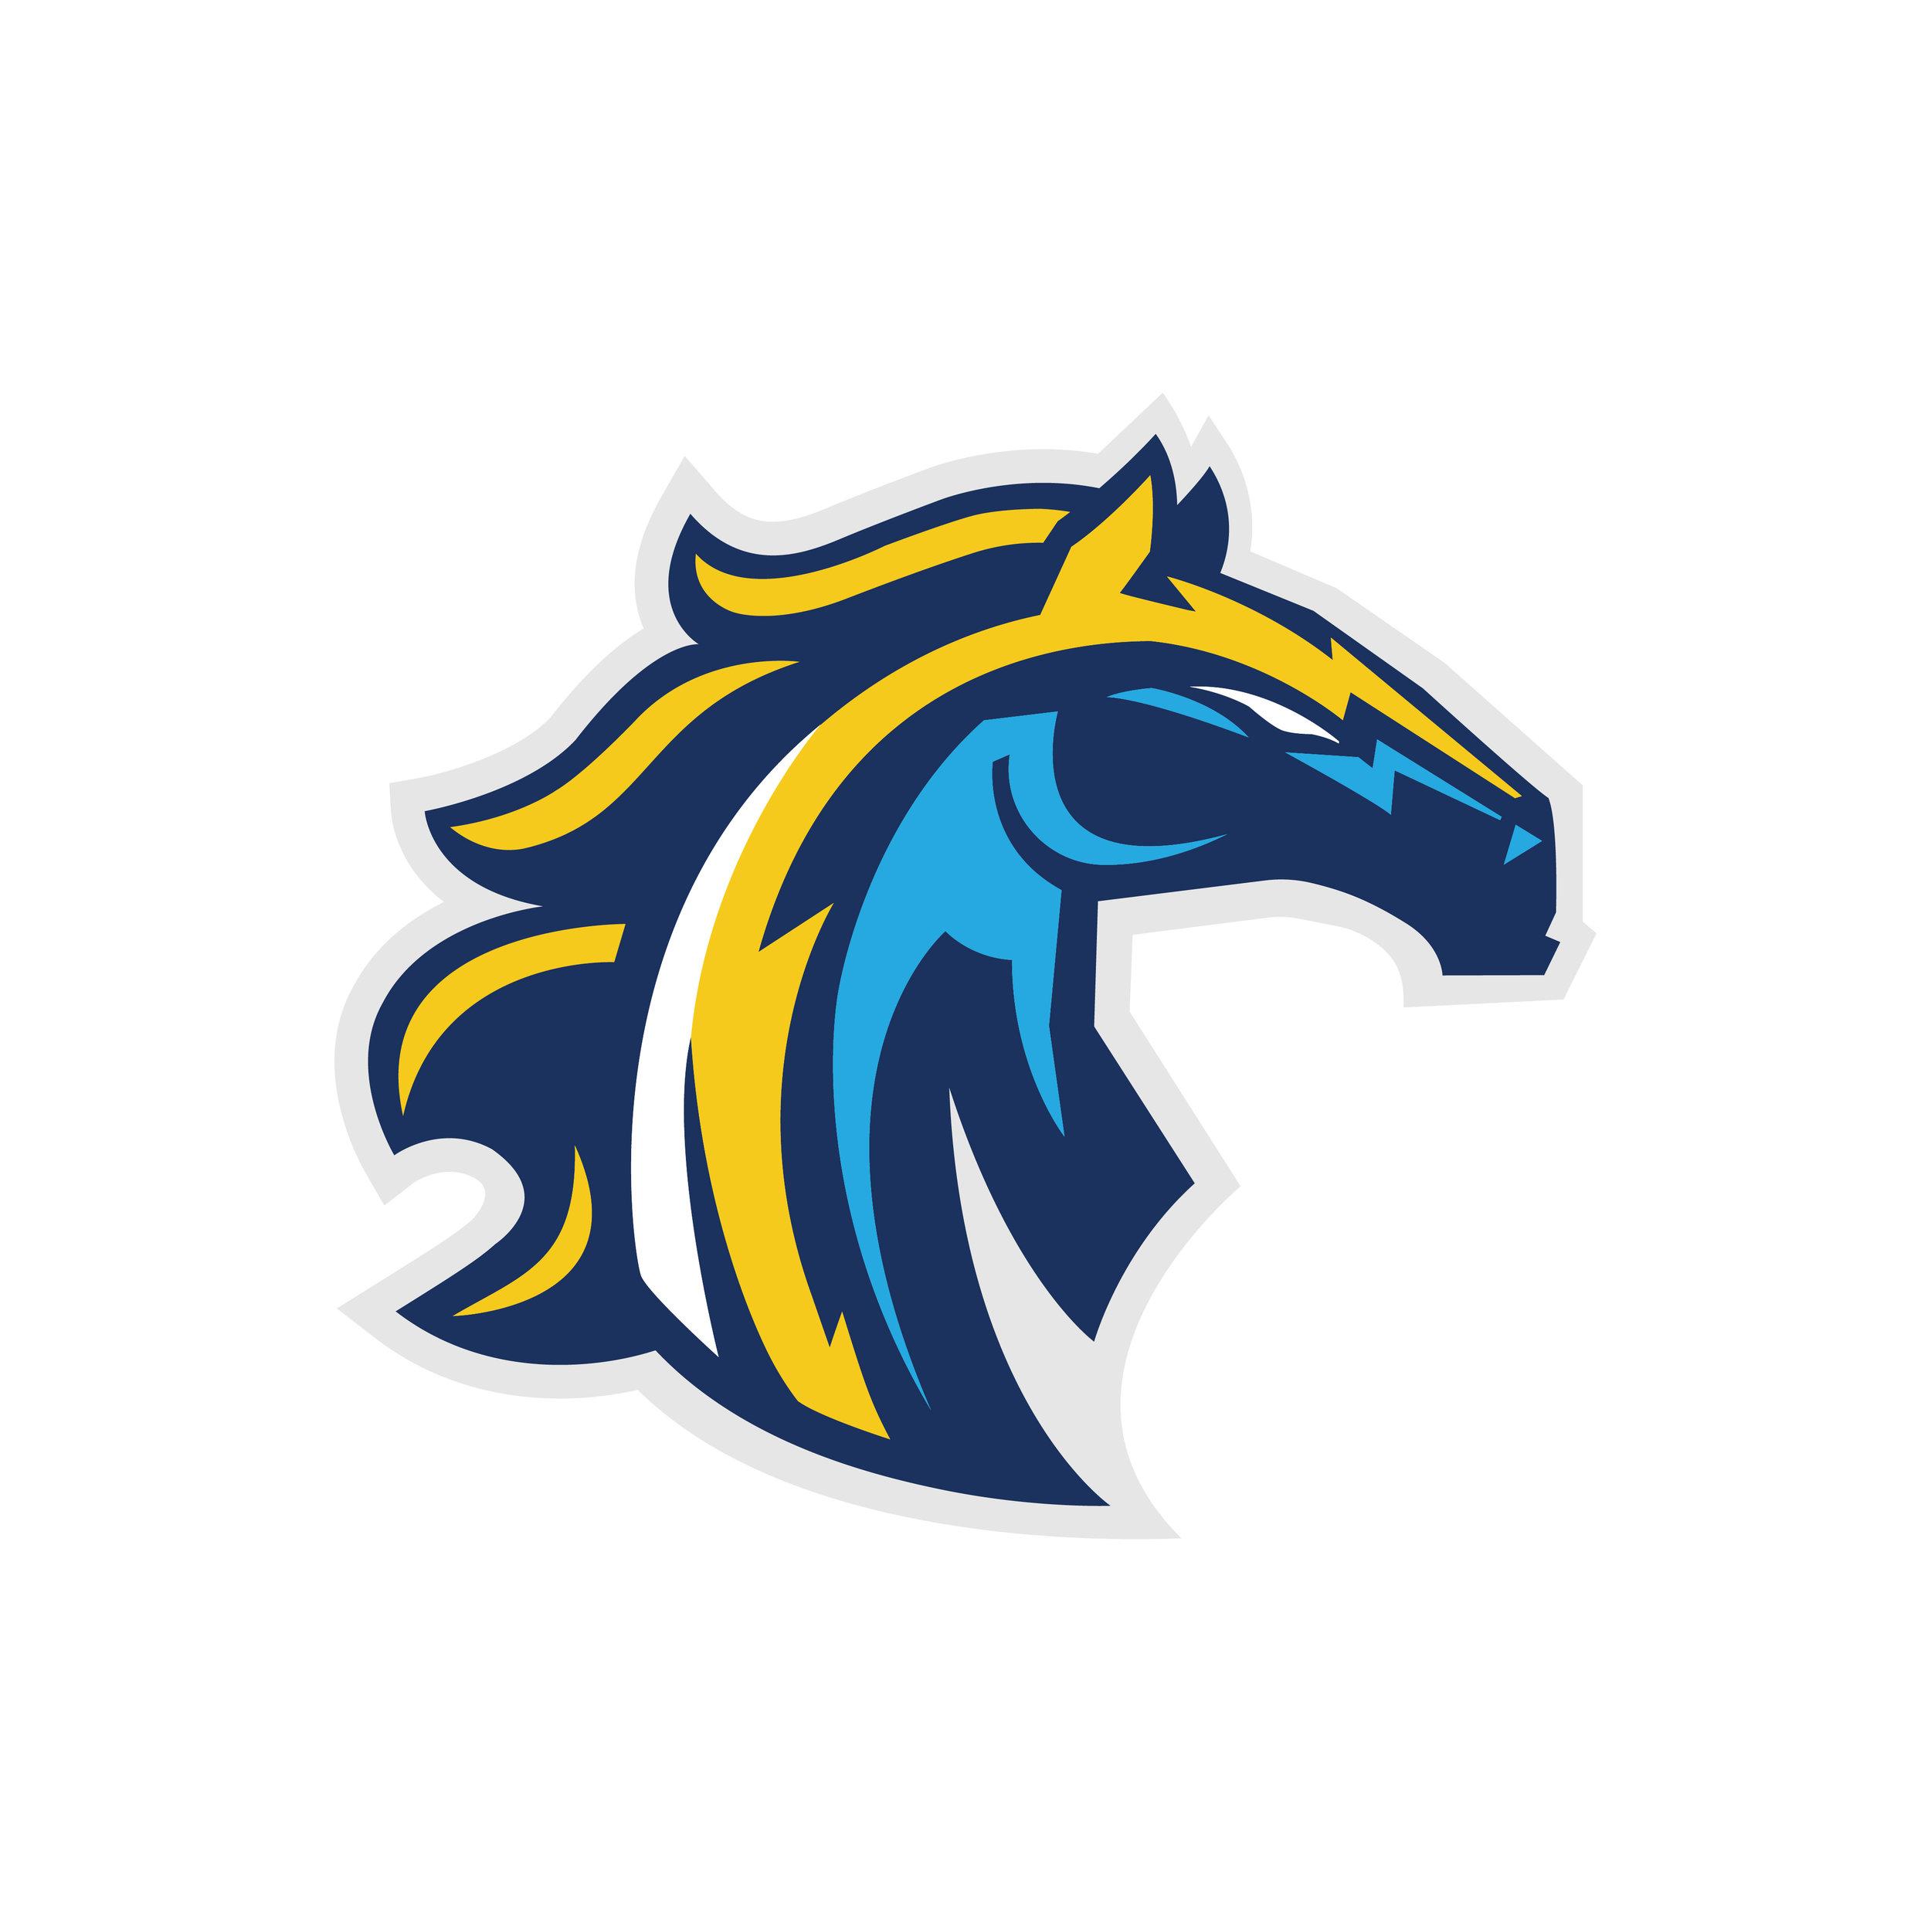 creative punch logo-62.jpg